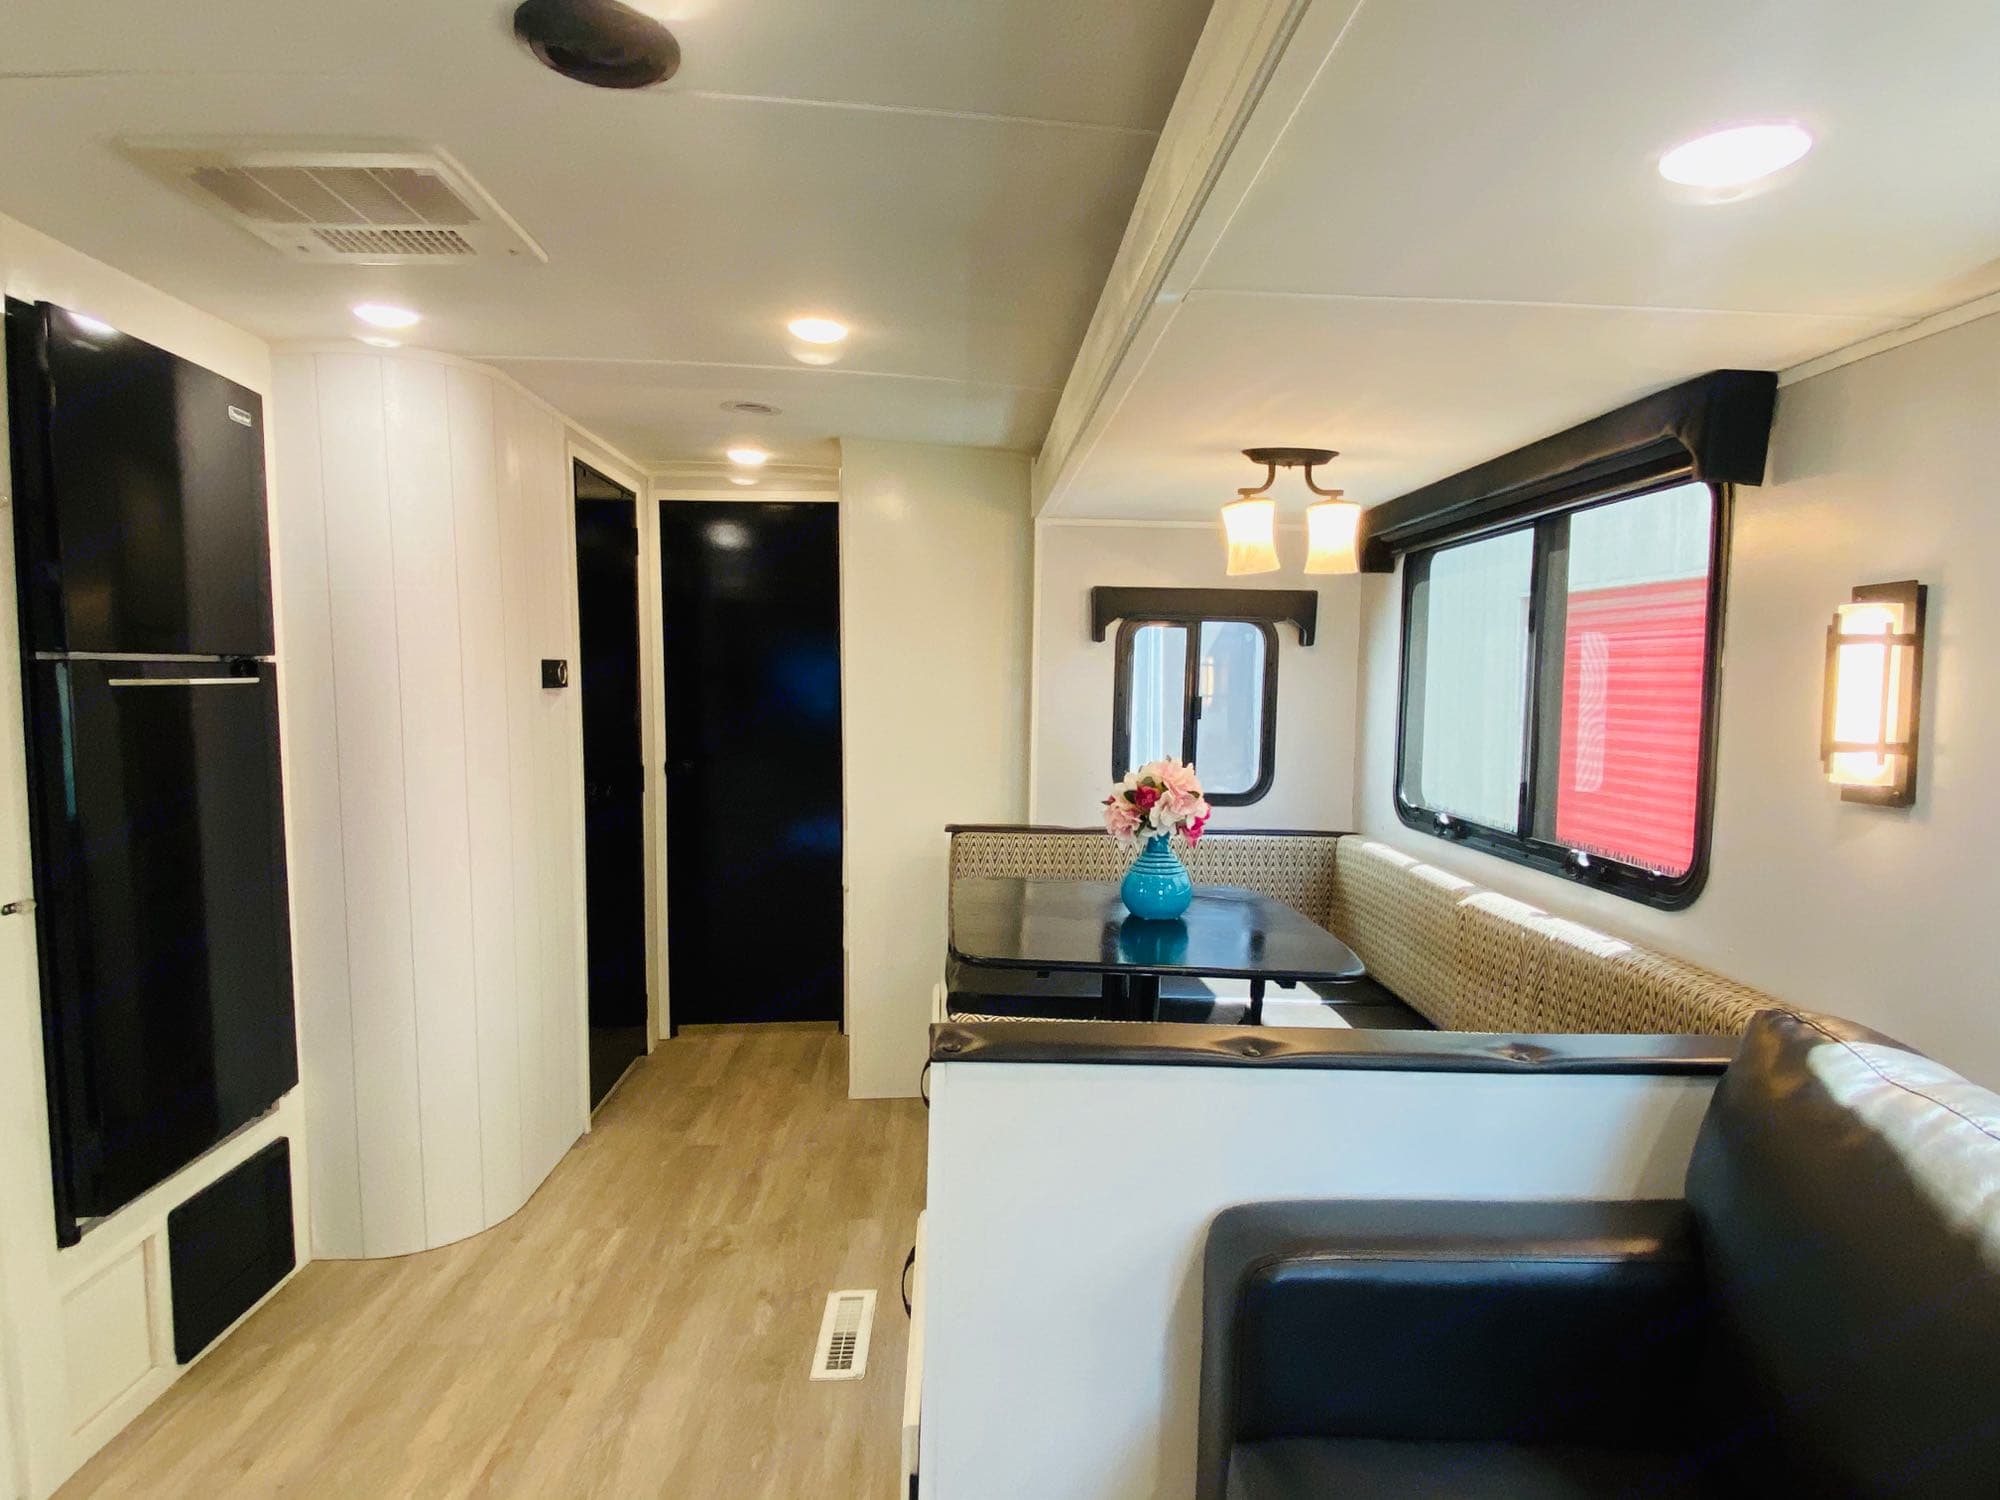 Full size fridge in the kitchen. Forest River Palomino Soloair 317 BHSK 2018